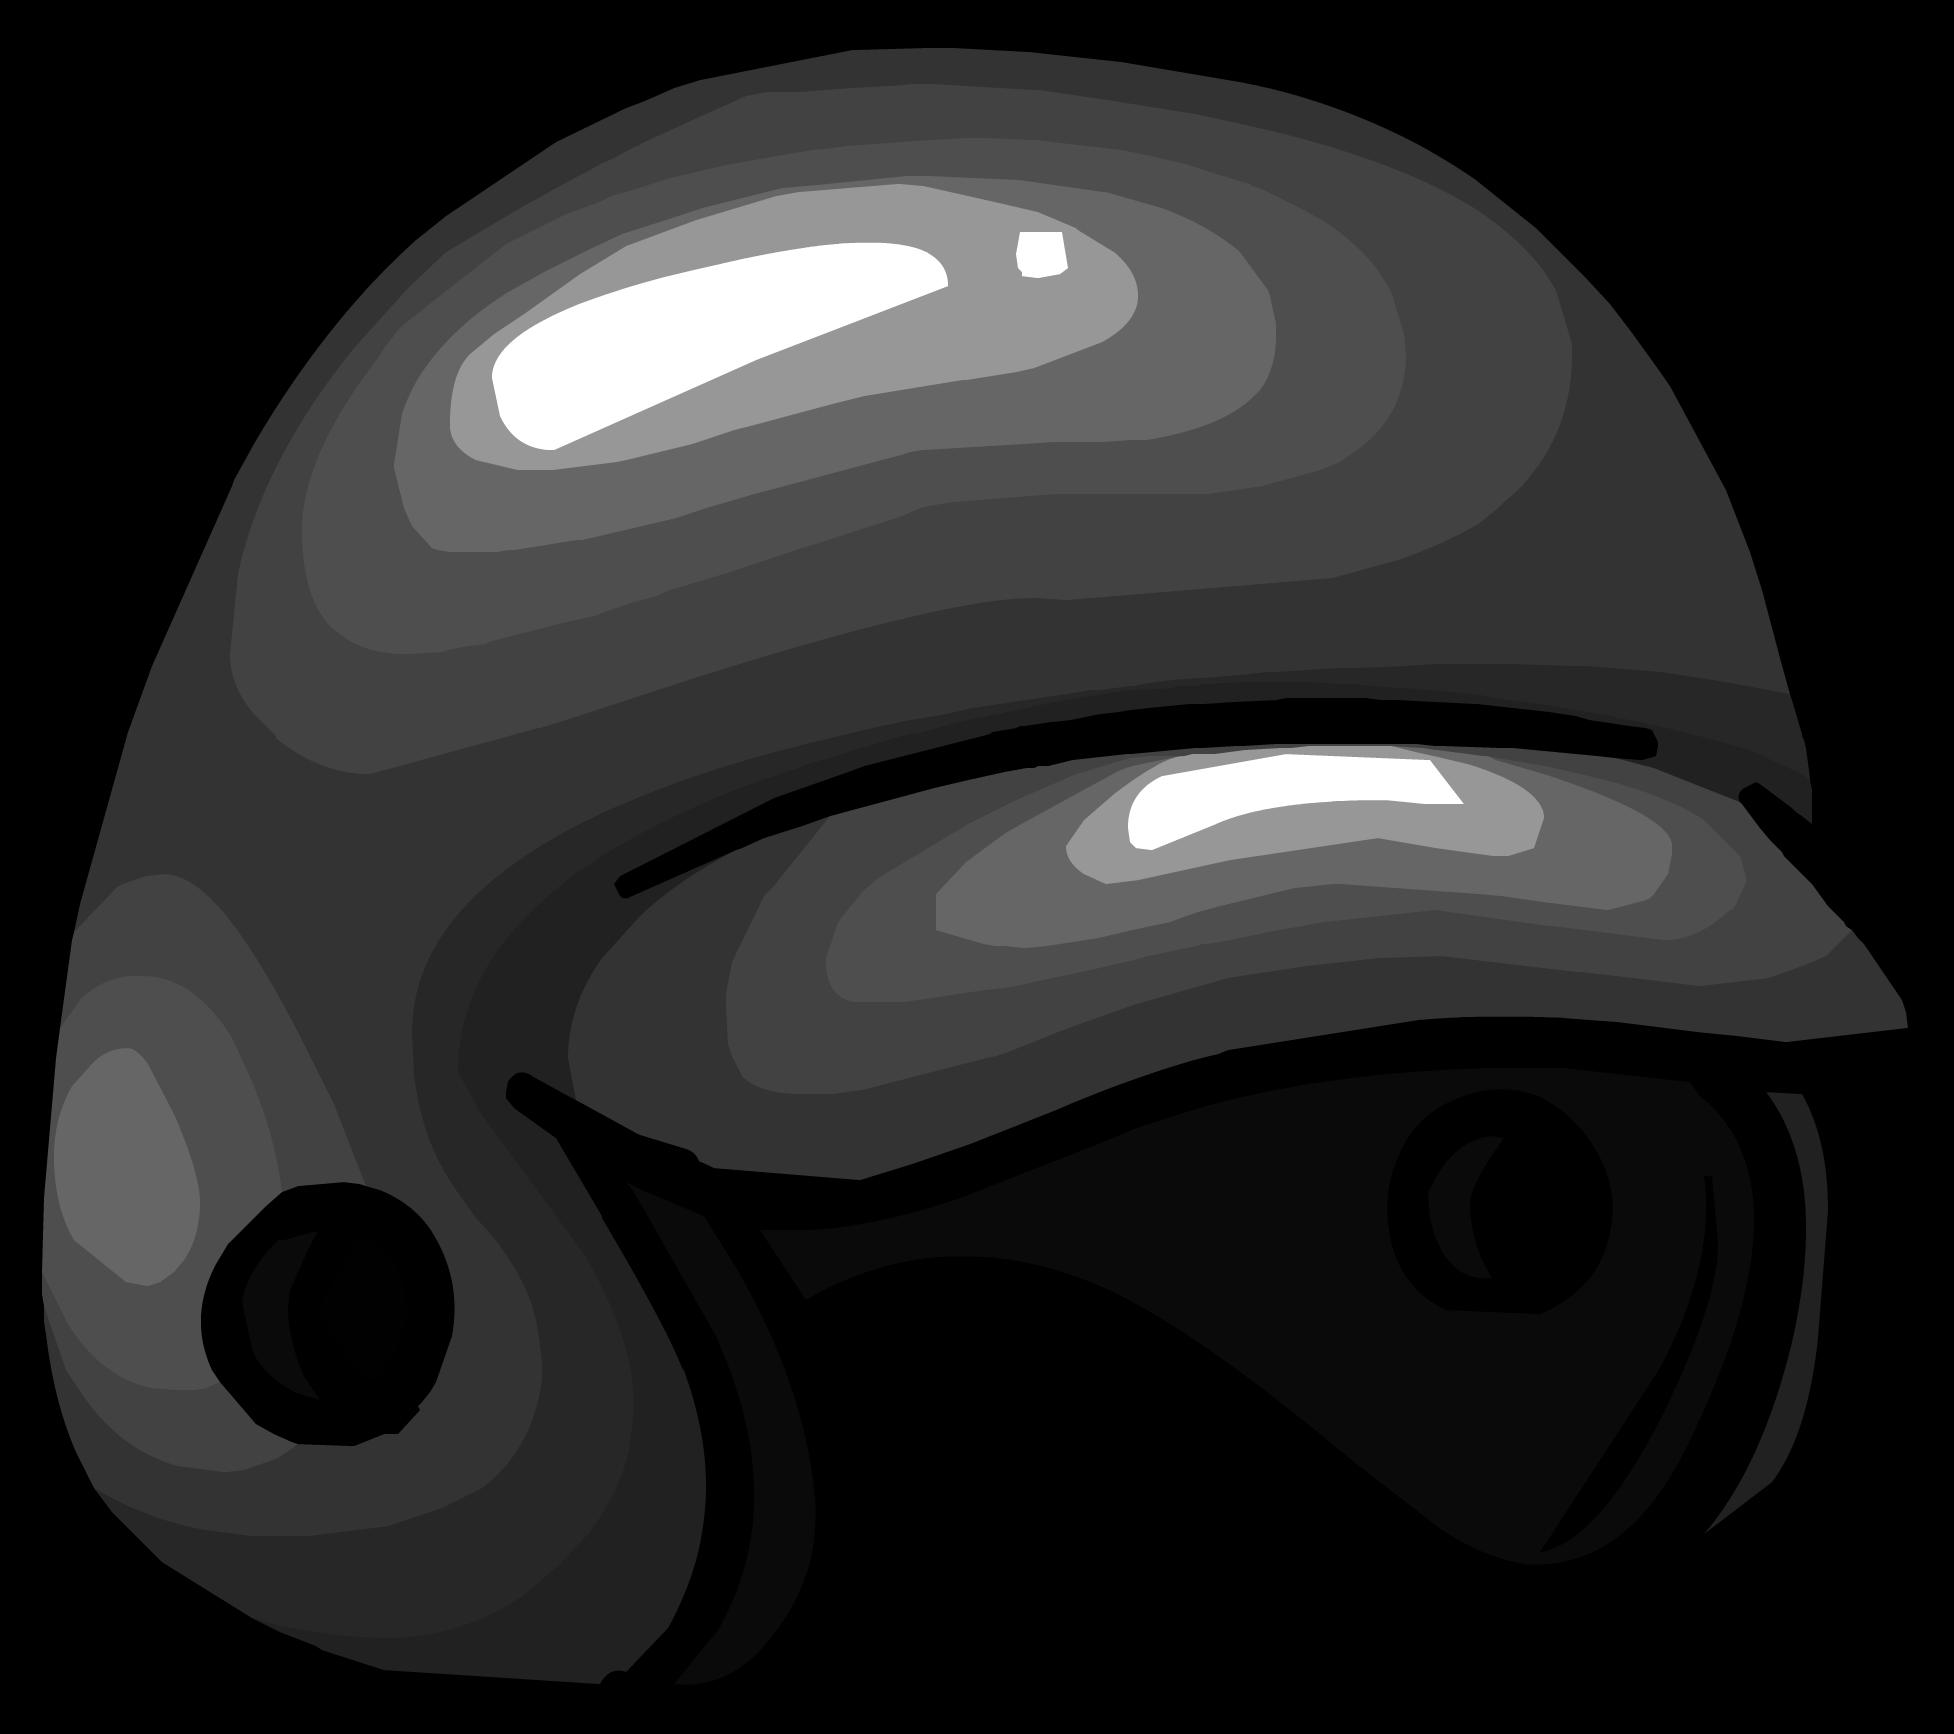 Clipart baseball helmet clipart freeuse Baseball Helmet | Club Penguin Wiki | FANDOM powered by Wikia clipart freeuse